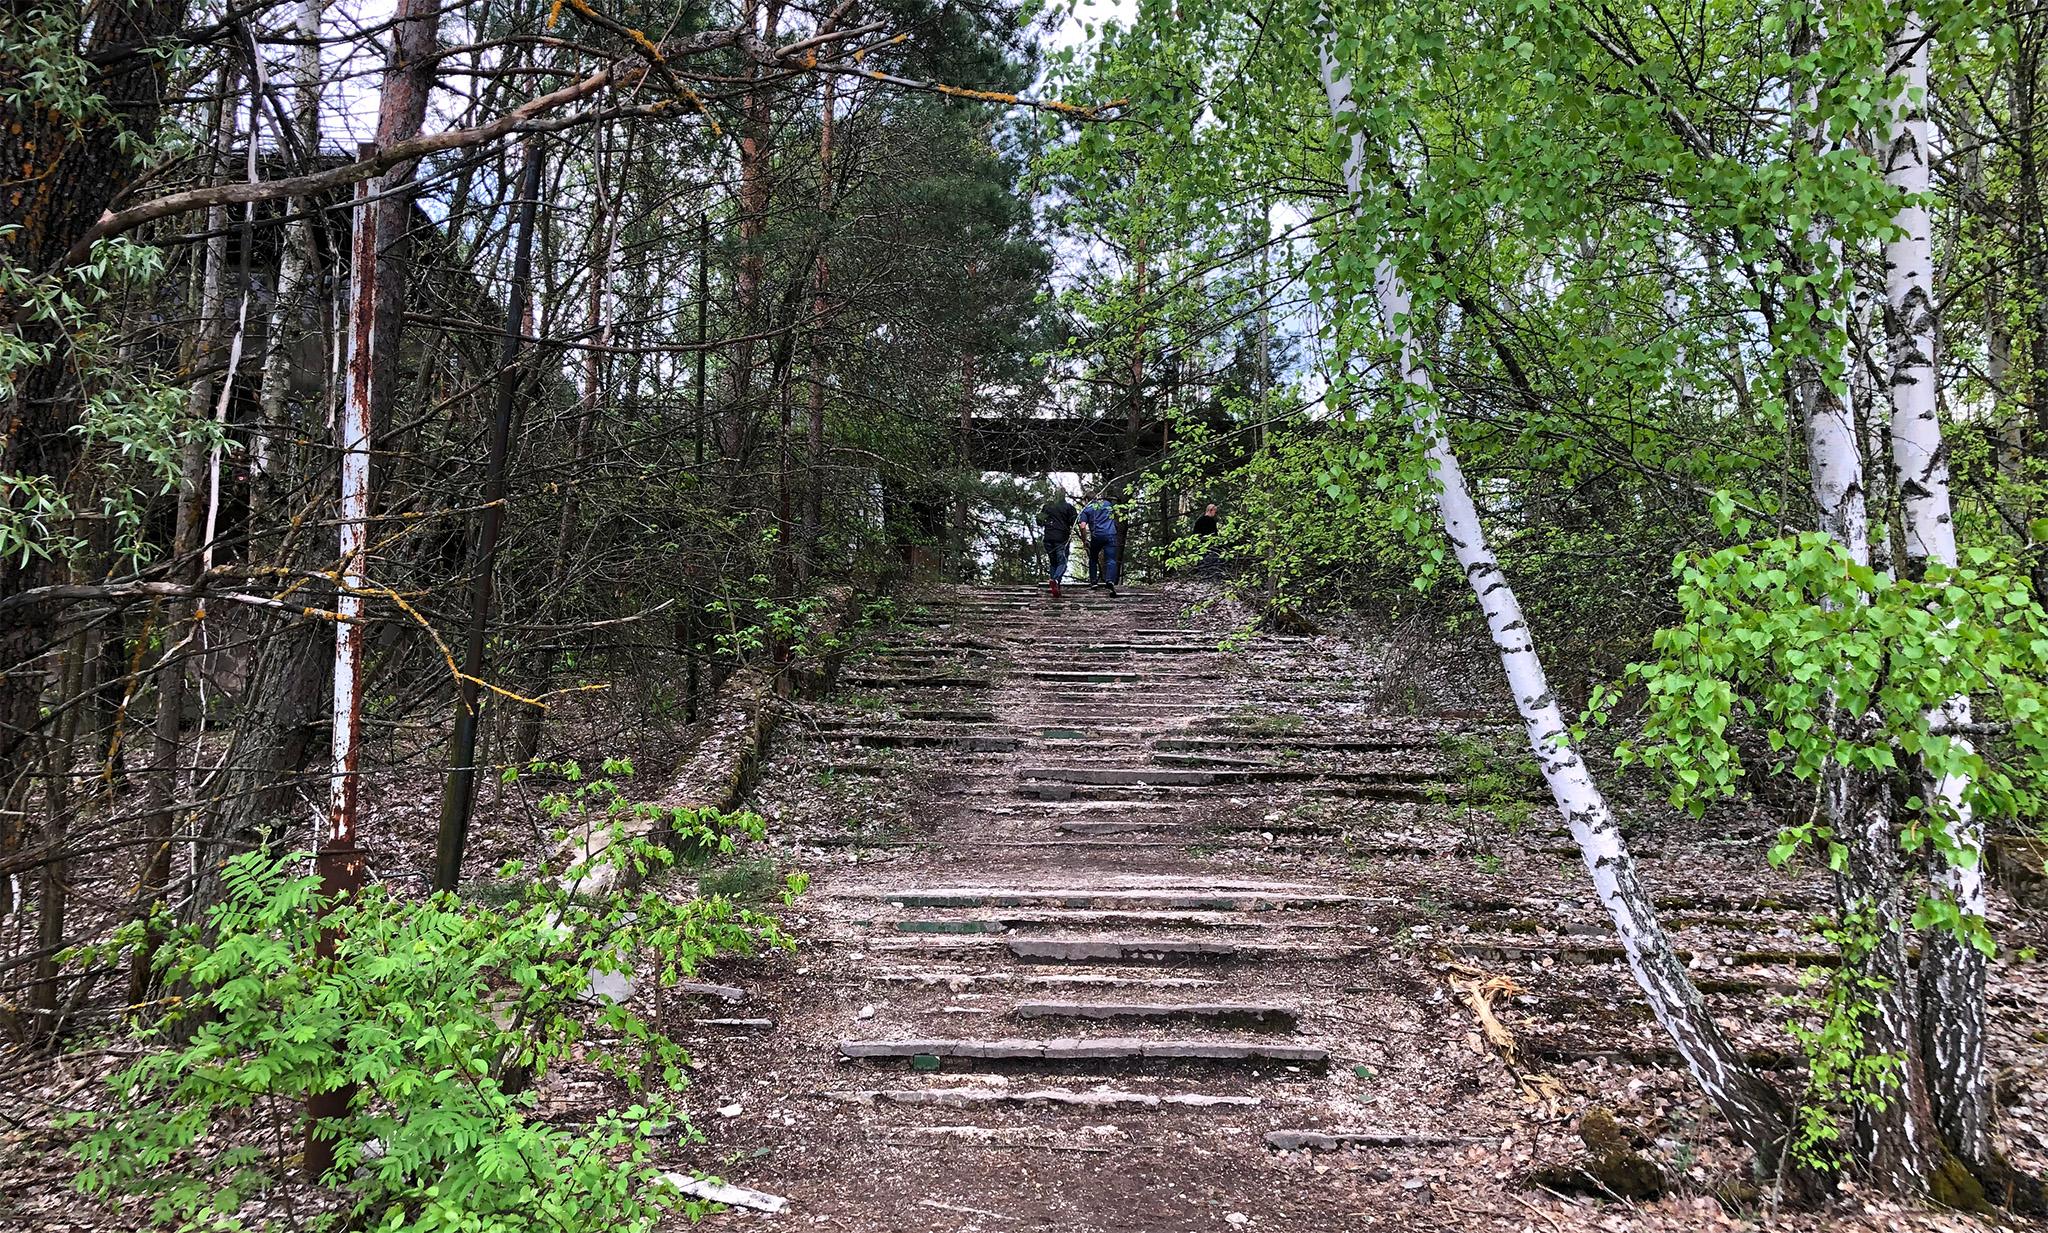 Visitar Chernóbil - Visitar Chernobyl Ucrania Ukraine Pripyat visitar chernóbil - 47045819484 fc939ae96d o - Visitar Chernóbil: el lugar más contaminado del planeta